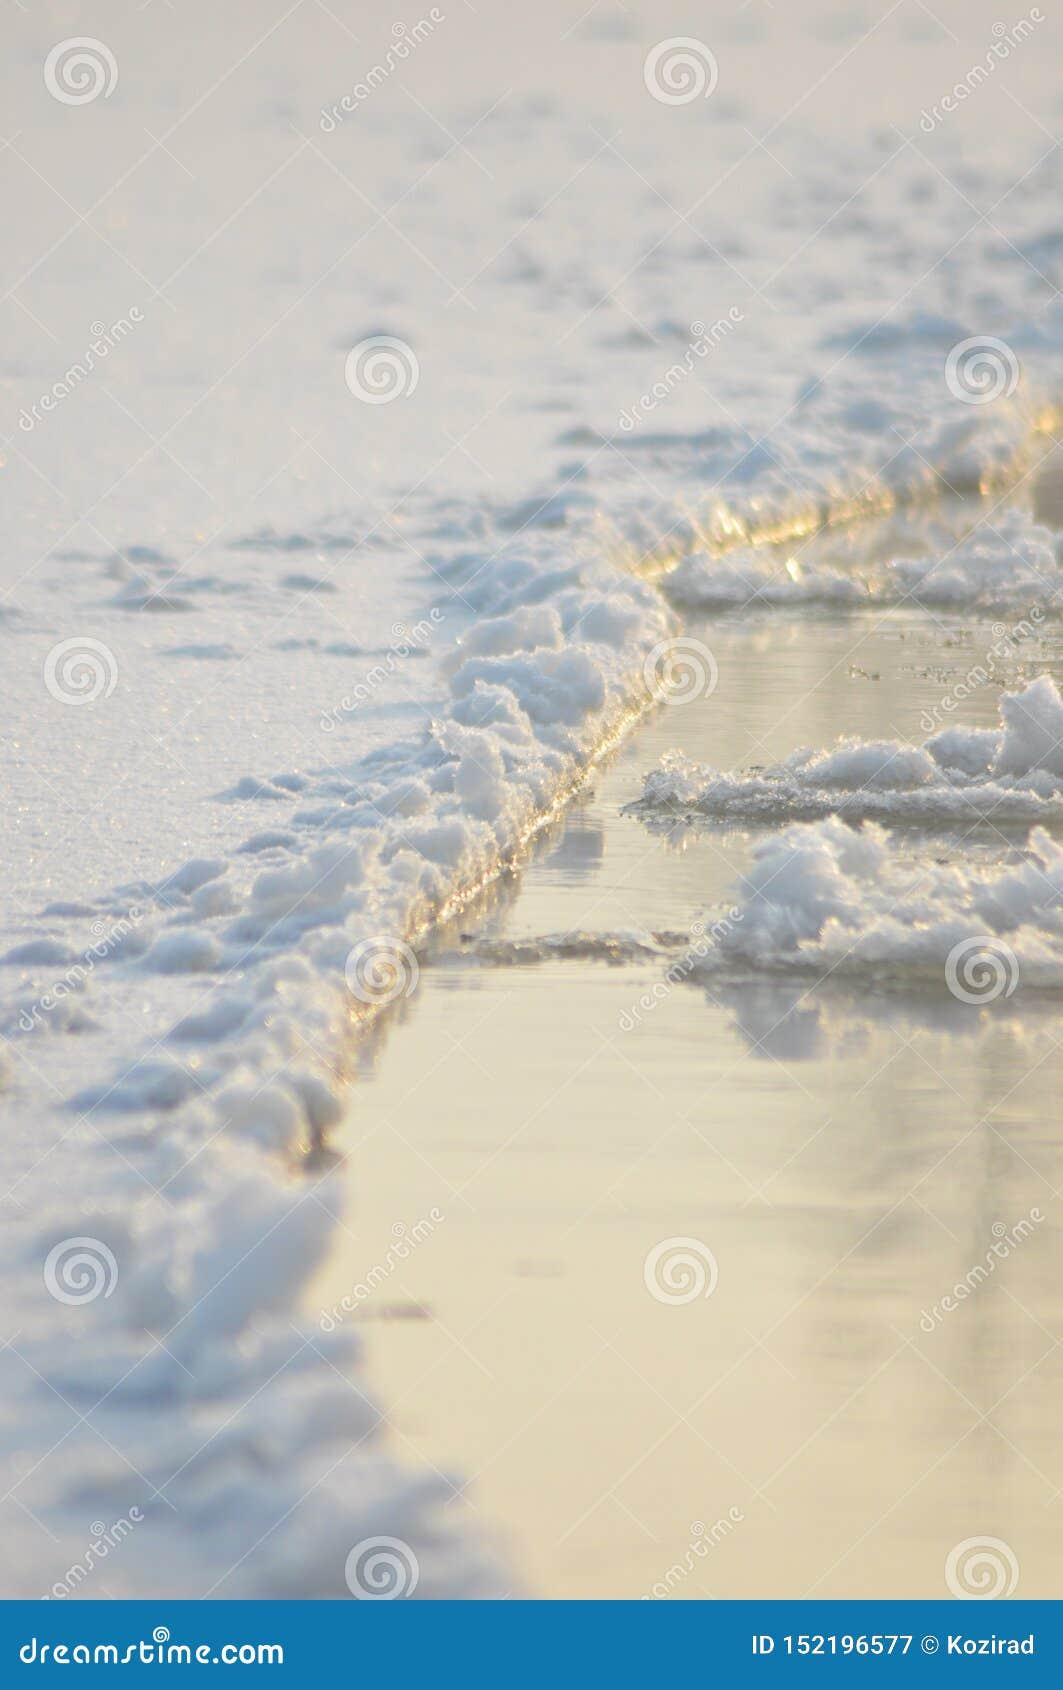 Rio de fluxo da banquisa O meio do inverno O leito fluvial Baixas temperaturas no dia gelado